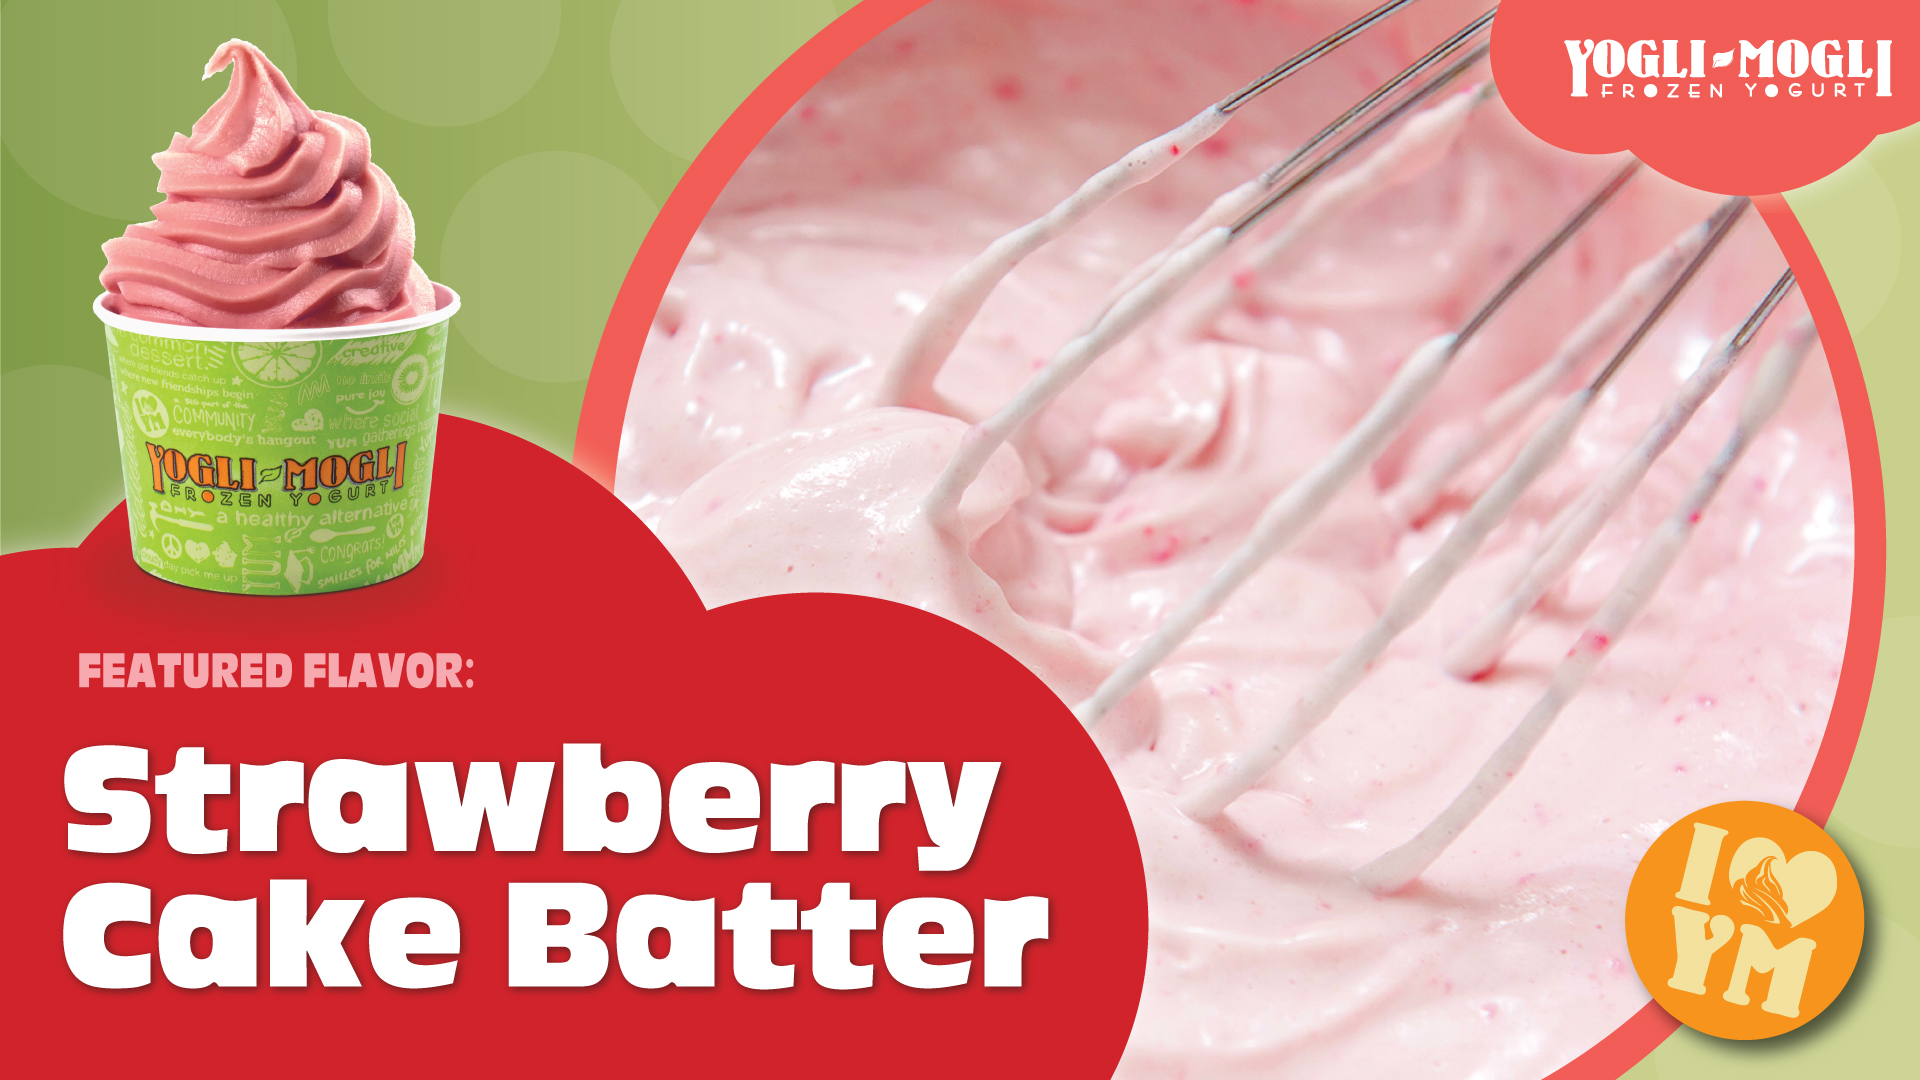 Strawberry Cake Batter